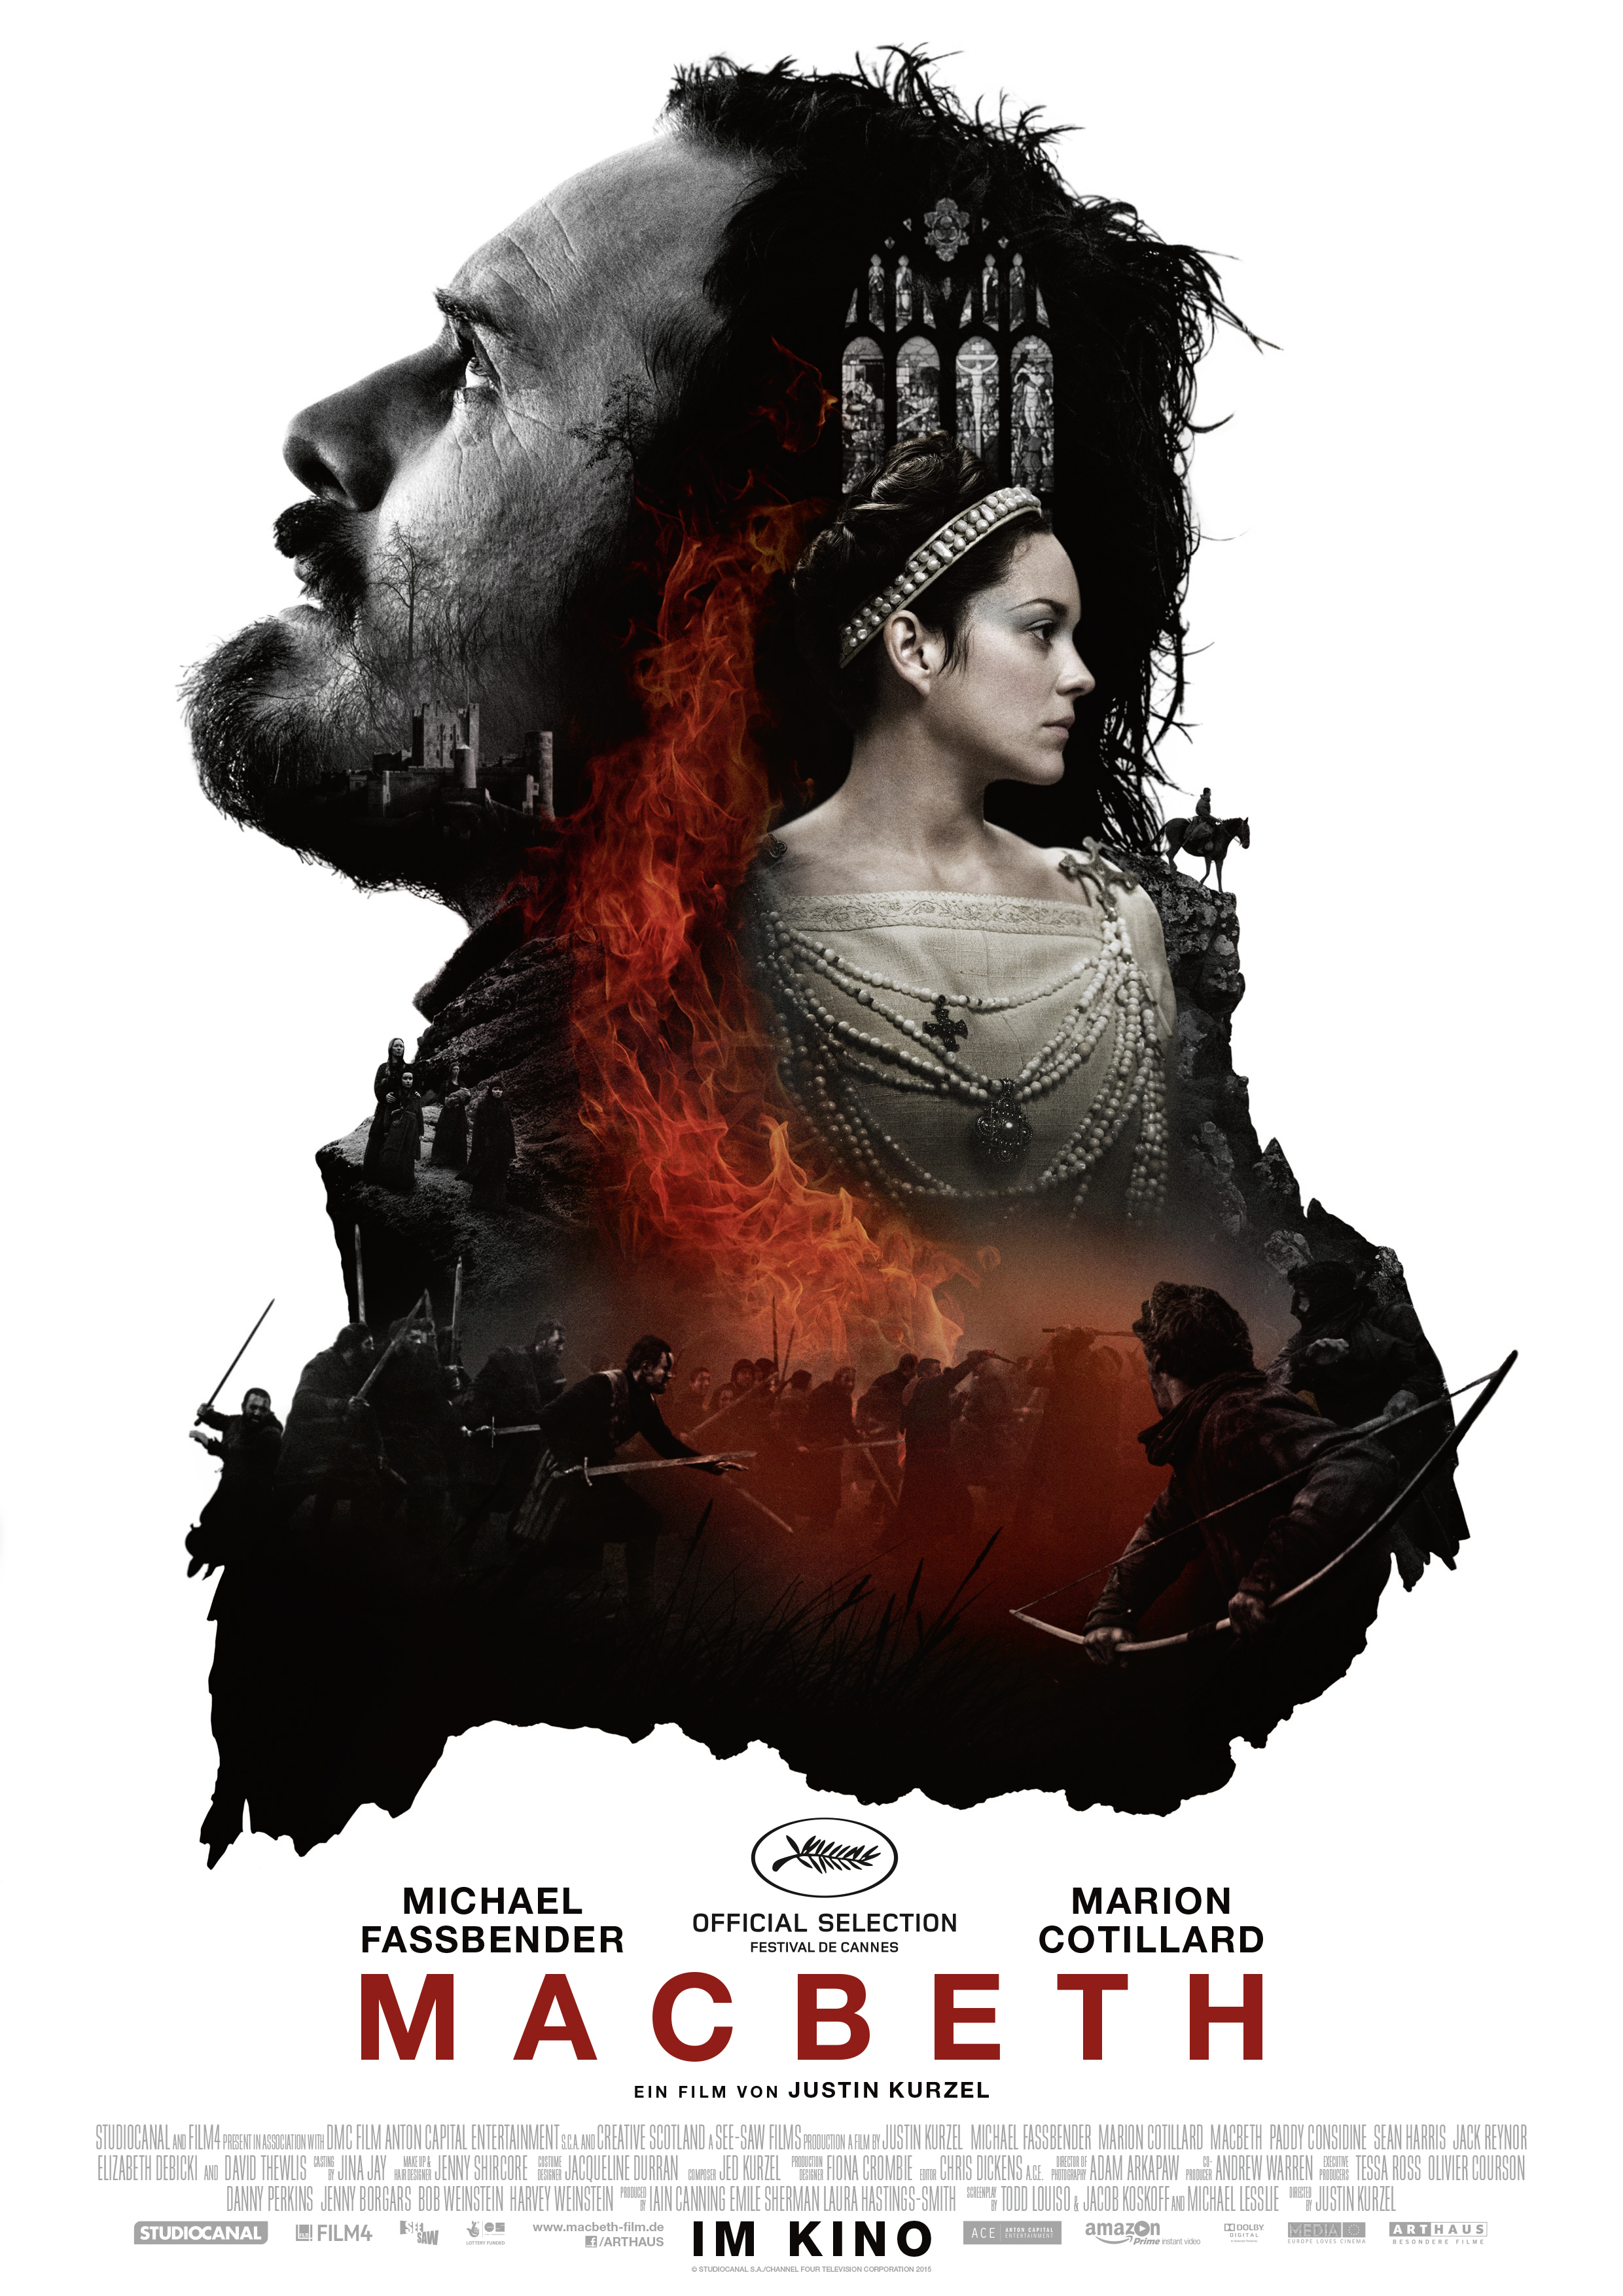 Macbeth | Wessels-Filmkritik.com